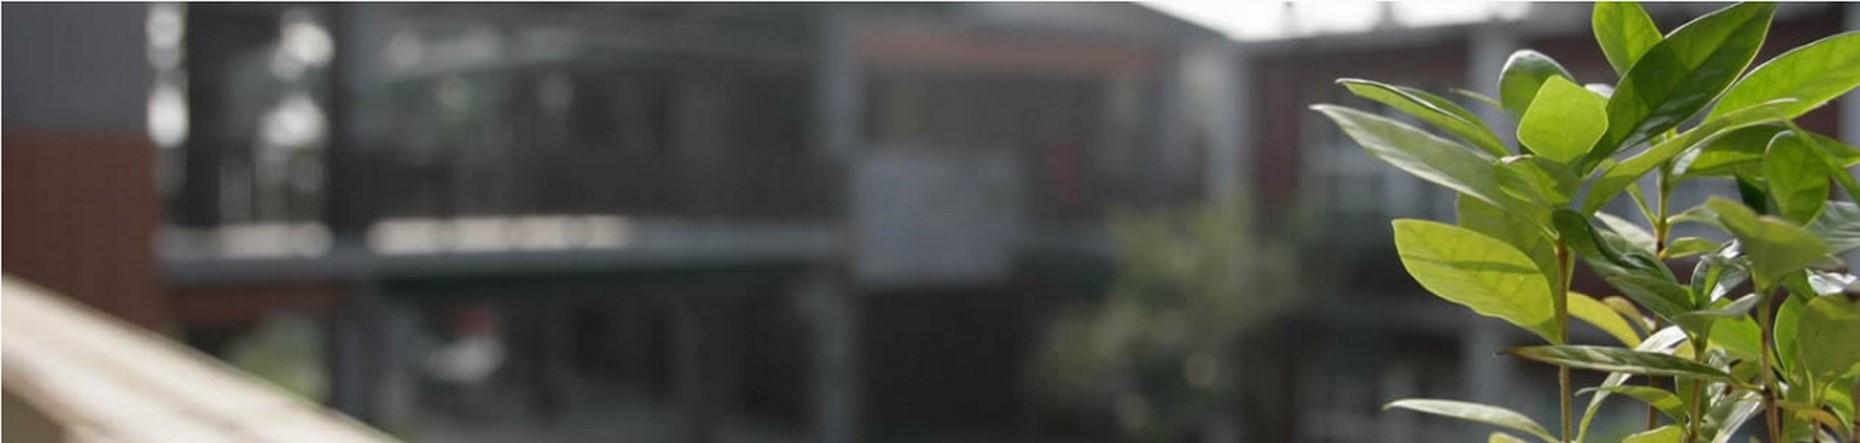 slider image 403